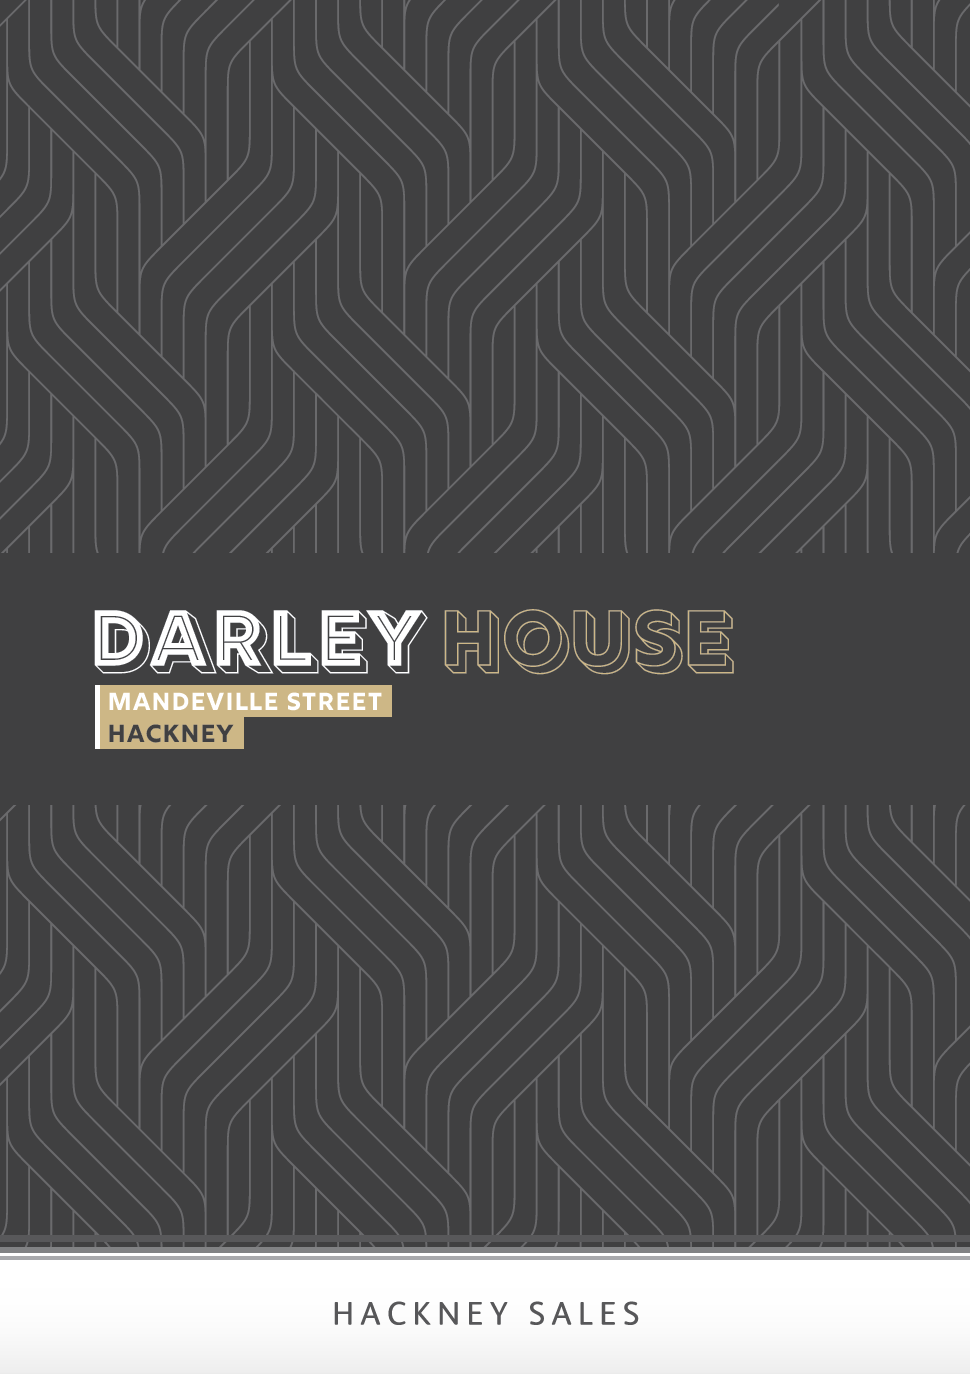 Darley House